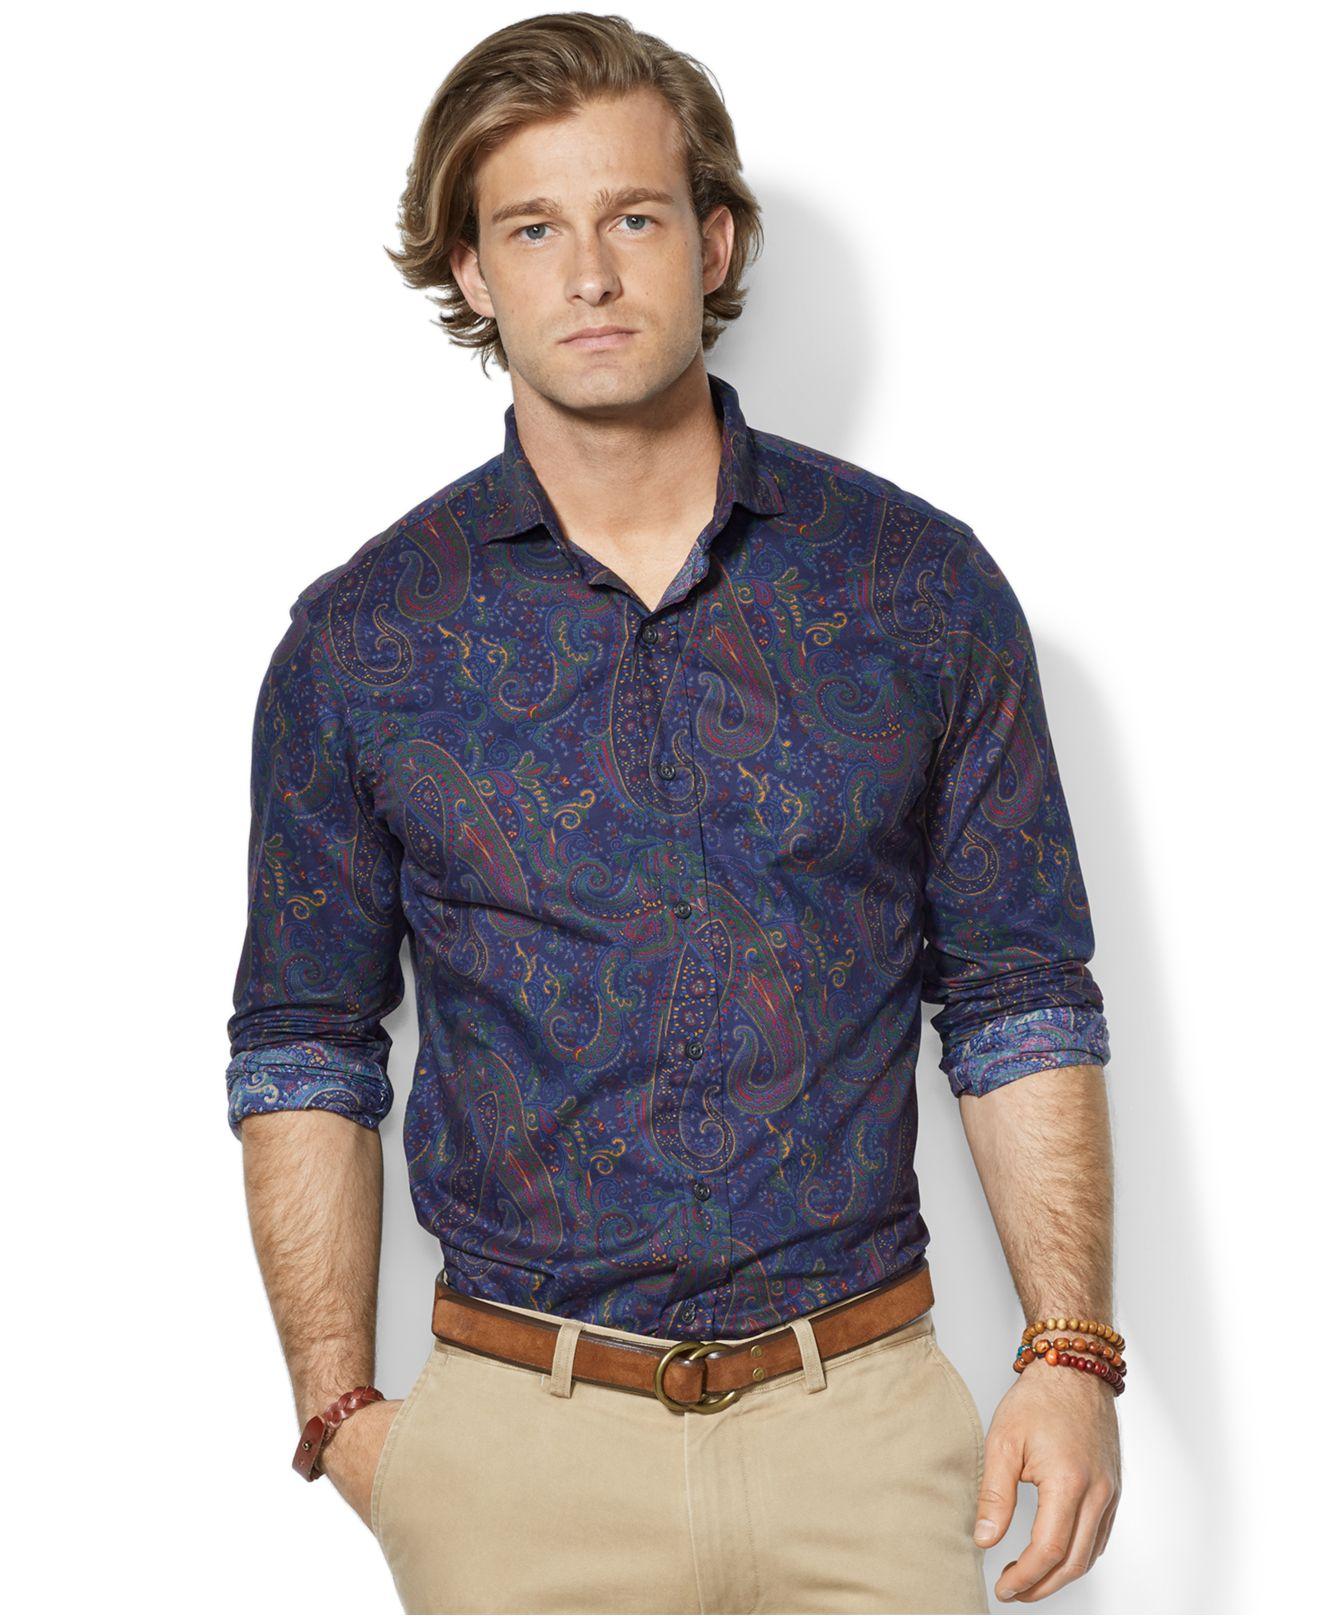 70ecd6dd65a ... coupon code for lyst polo ralph lauren paisley estate shirt for men  f218a e2d04 ...